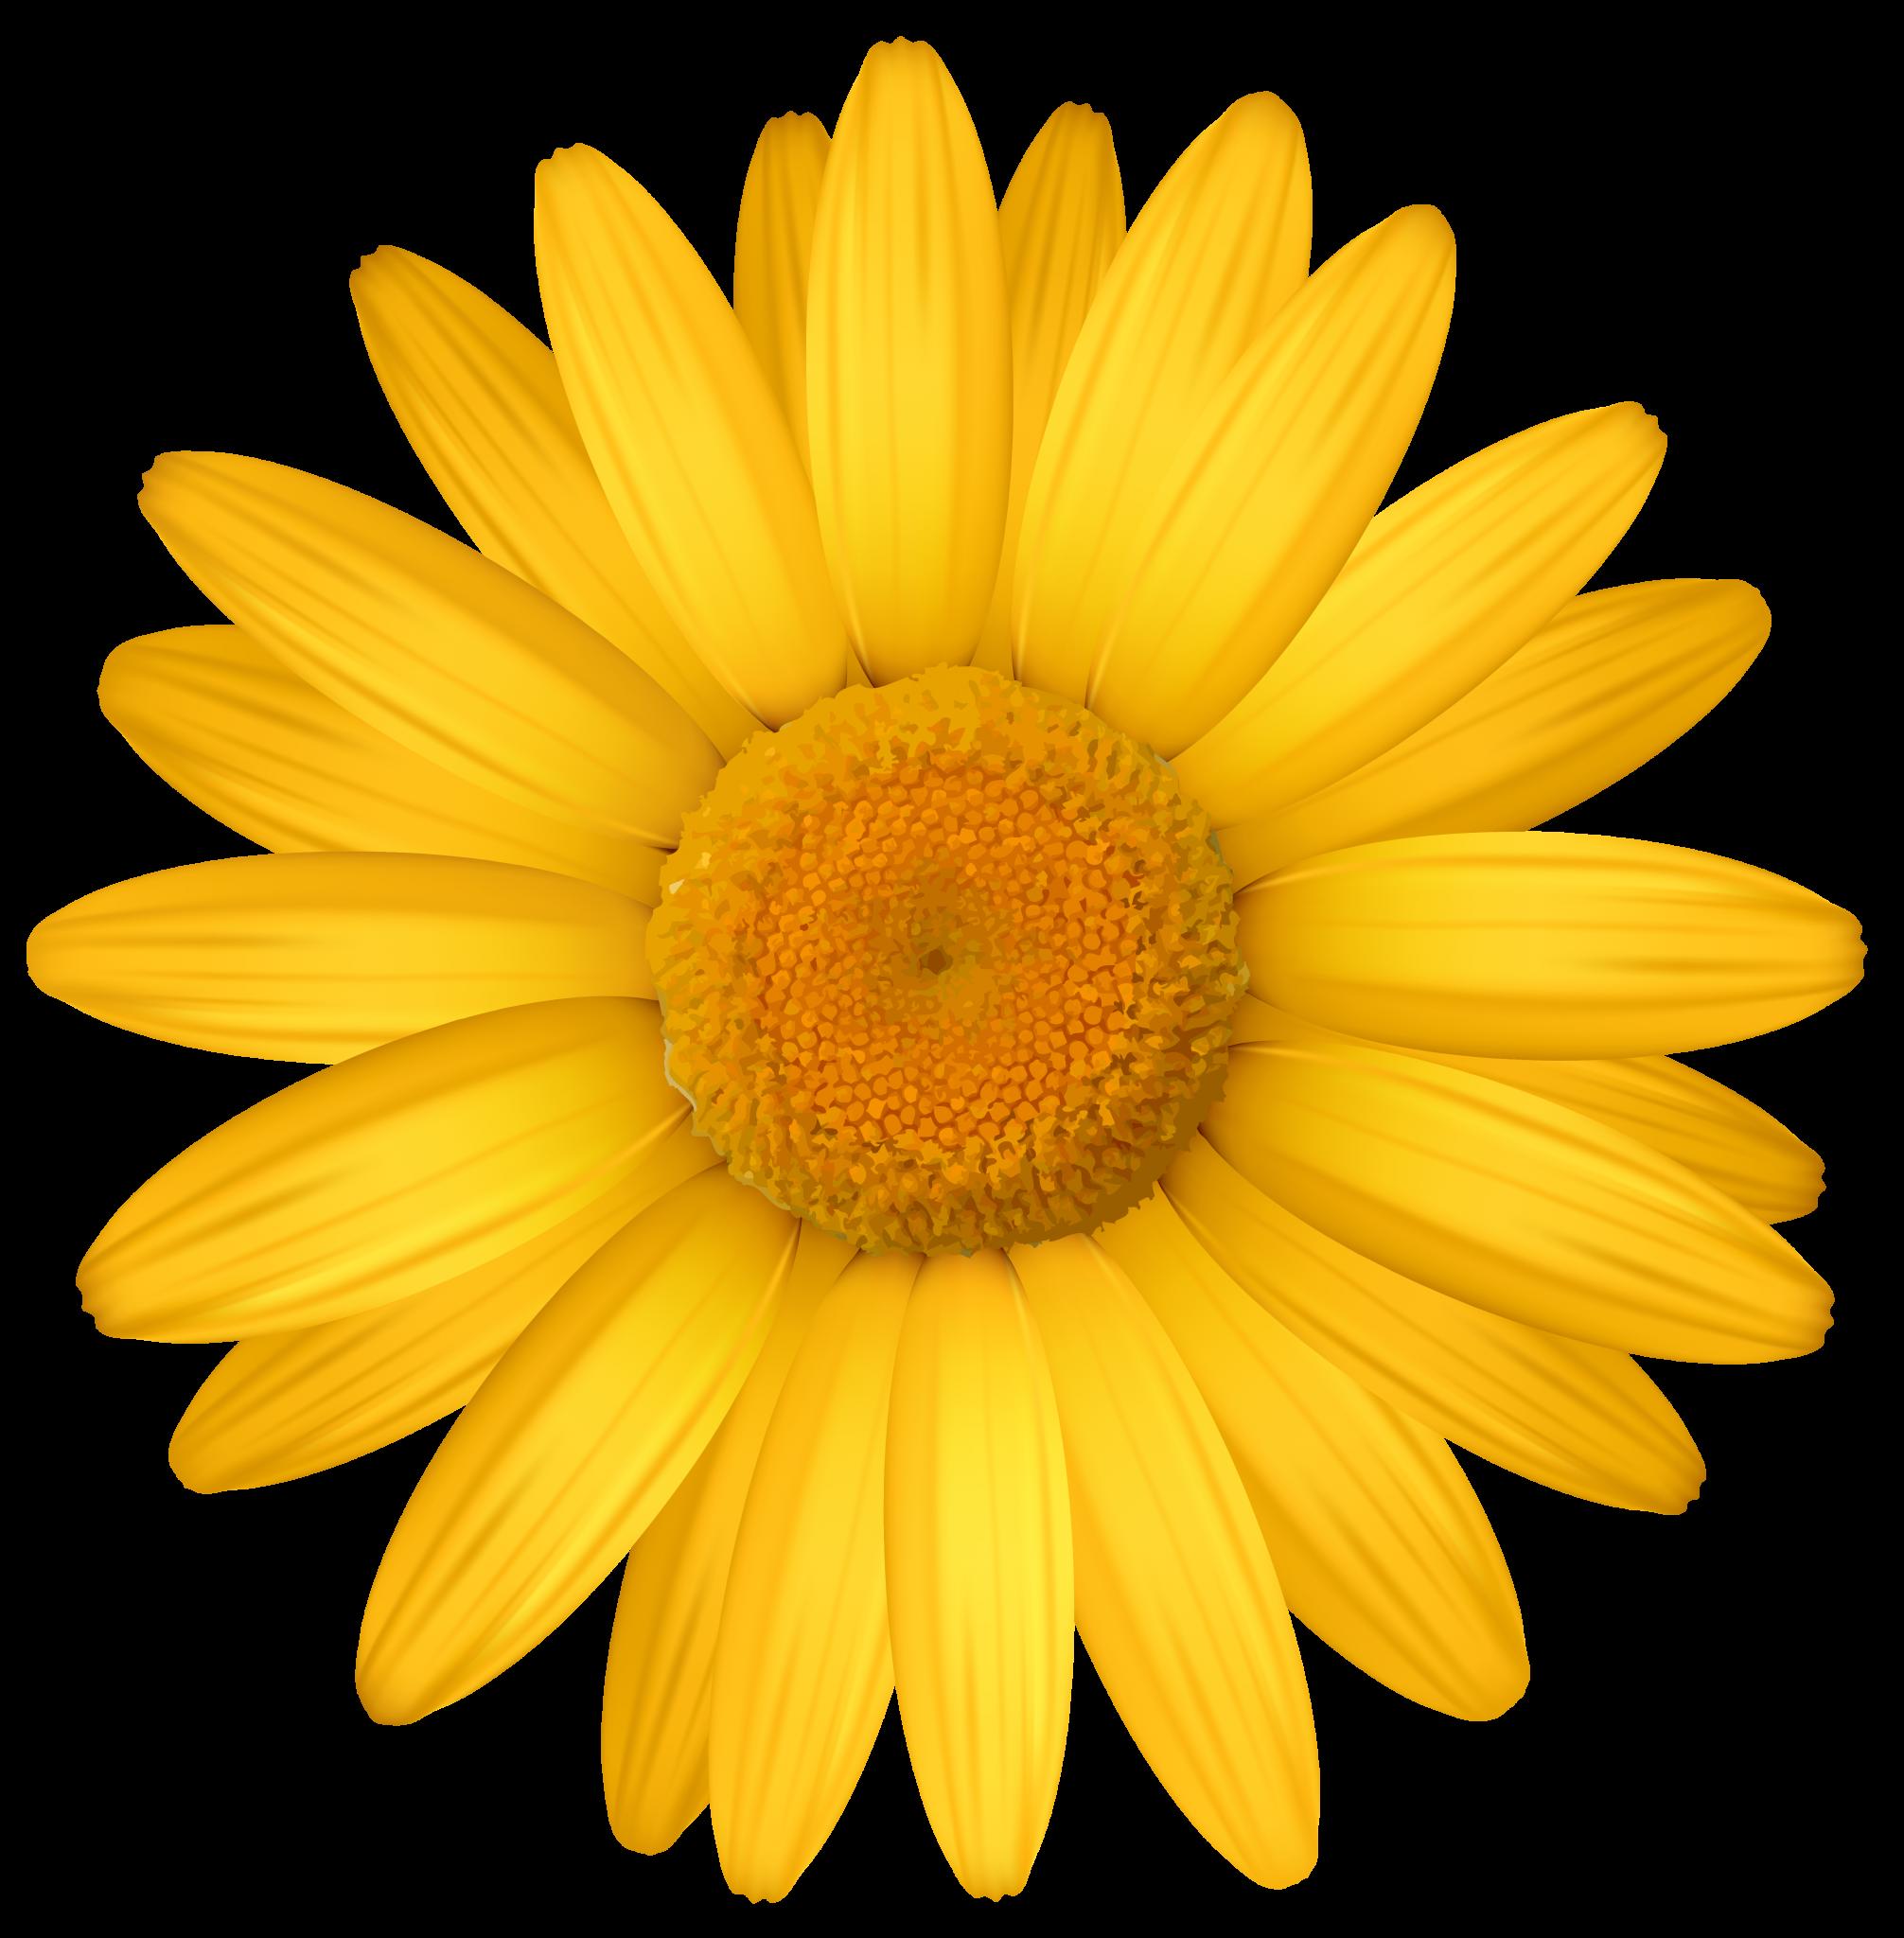 Yellow Widescreen Backgrounds Flower Clipart Png Flower Clipart Daisy